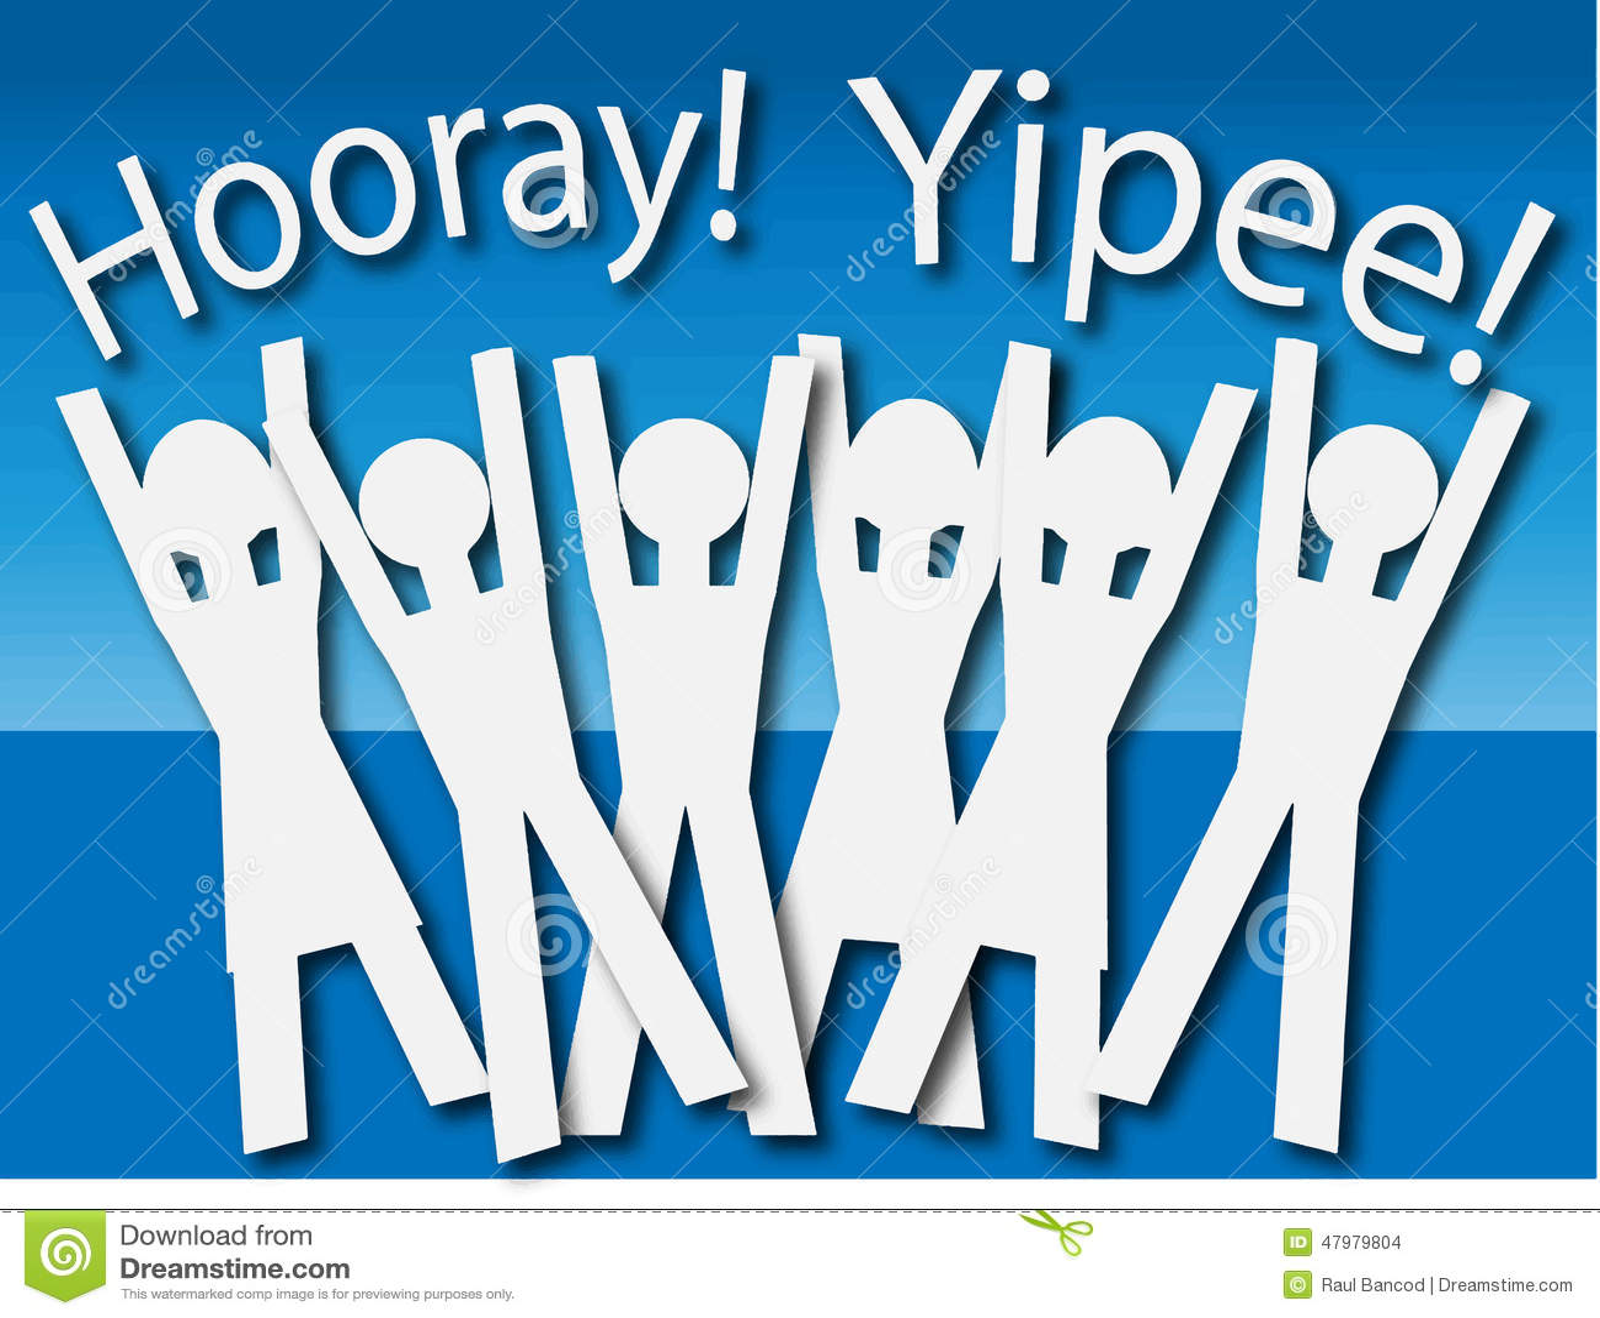 Hooray Clip Art hooray stock illustrations, vectors, & clipart ...